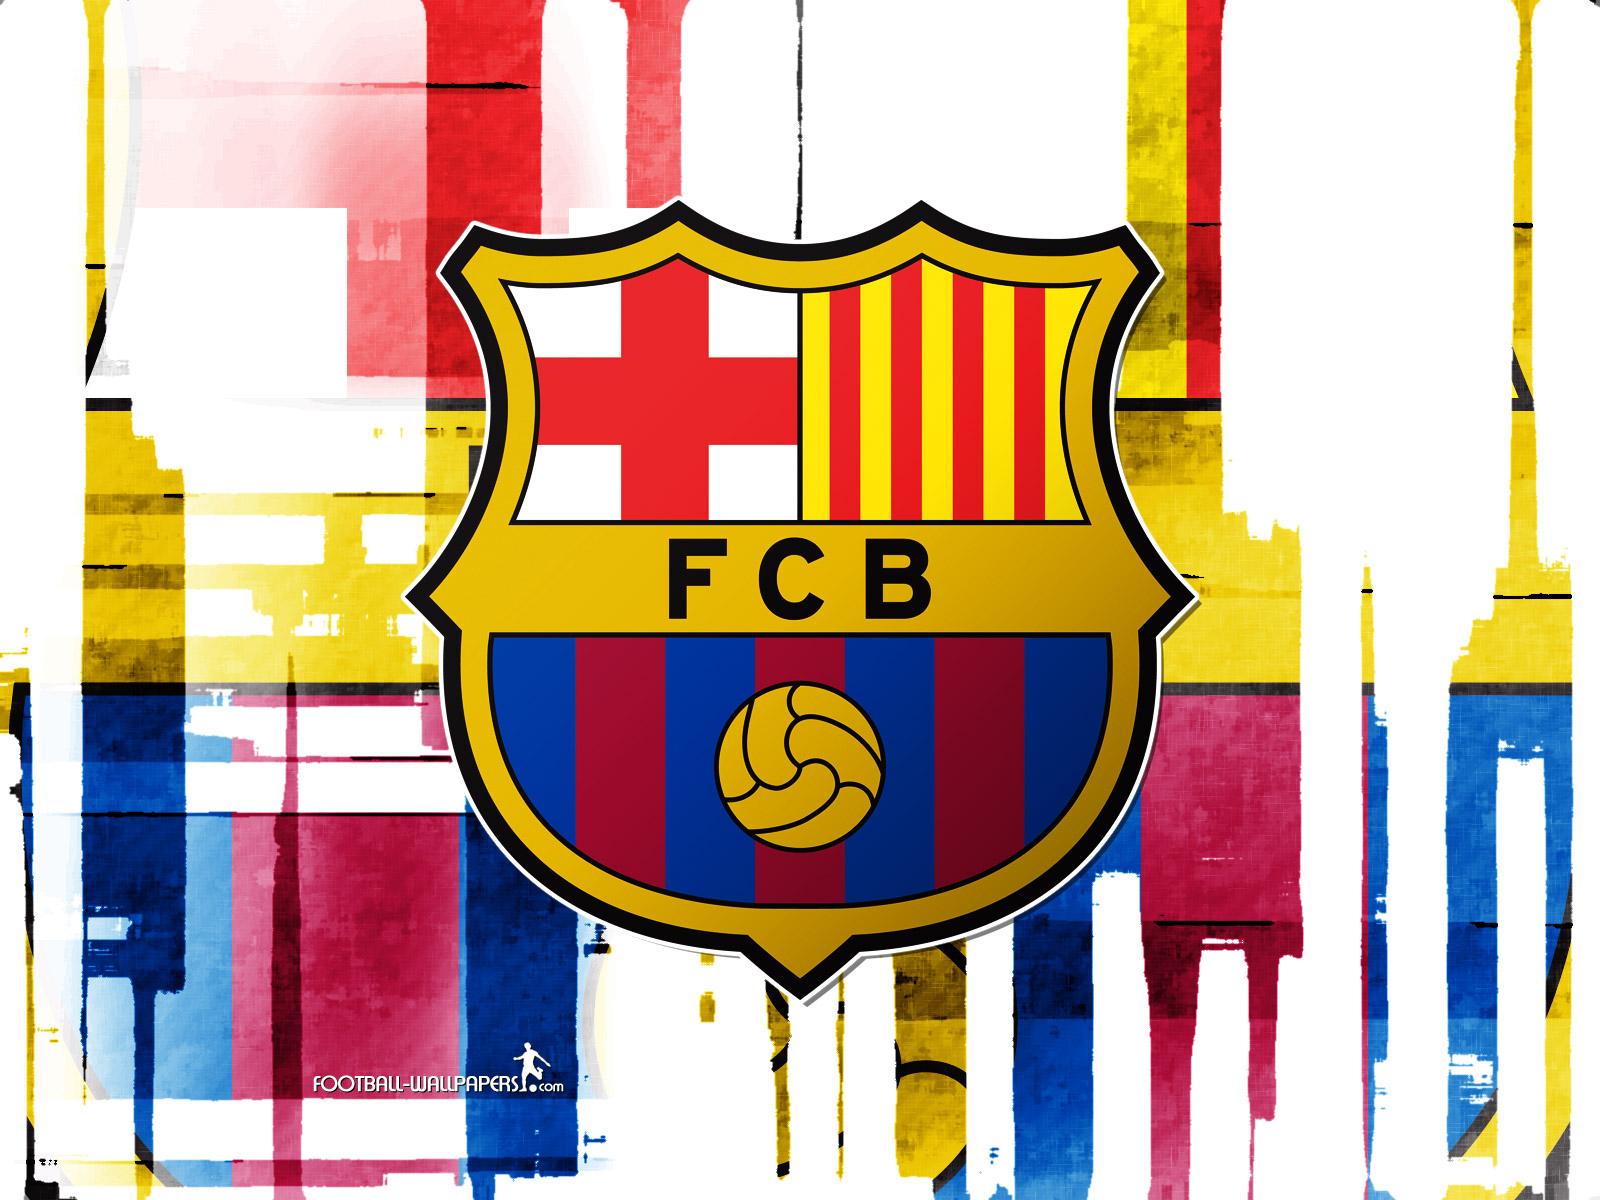 FC Barcelona Wallpapers fc barcelona 484407 1600 1200jpg 1600x1200